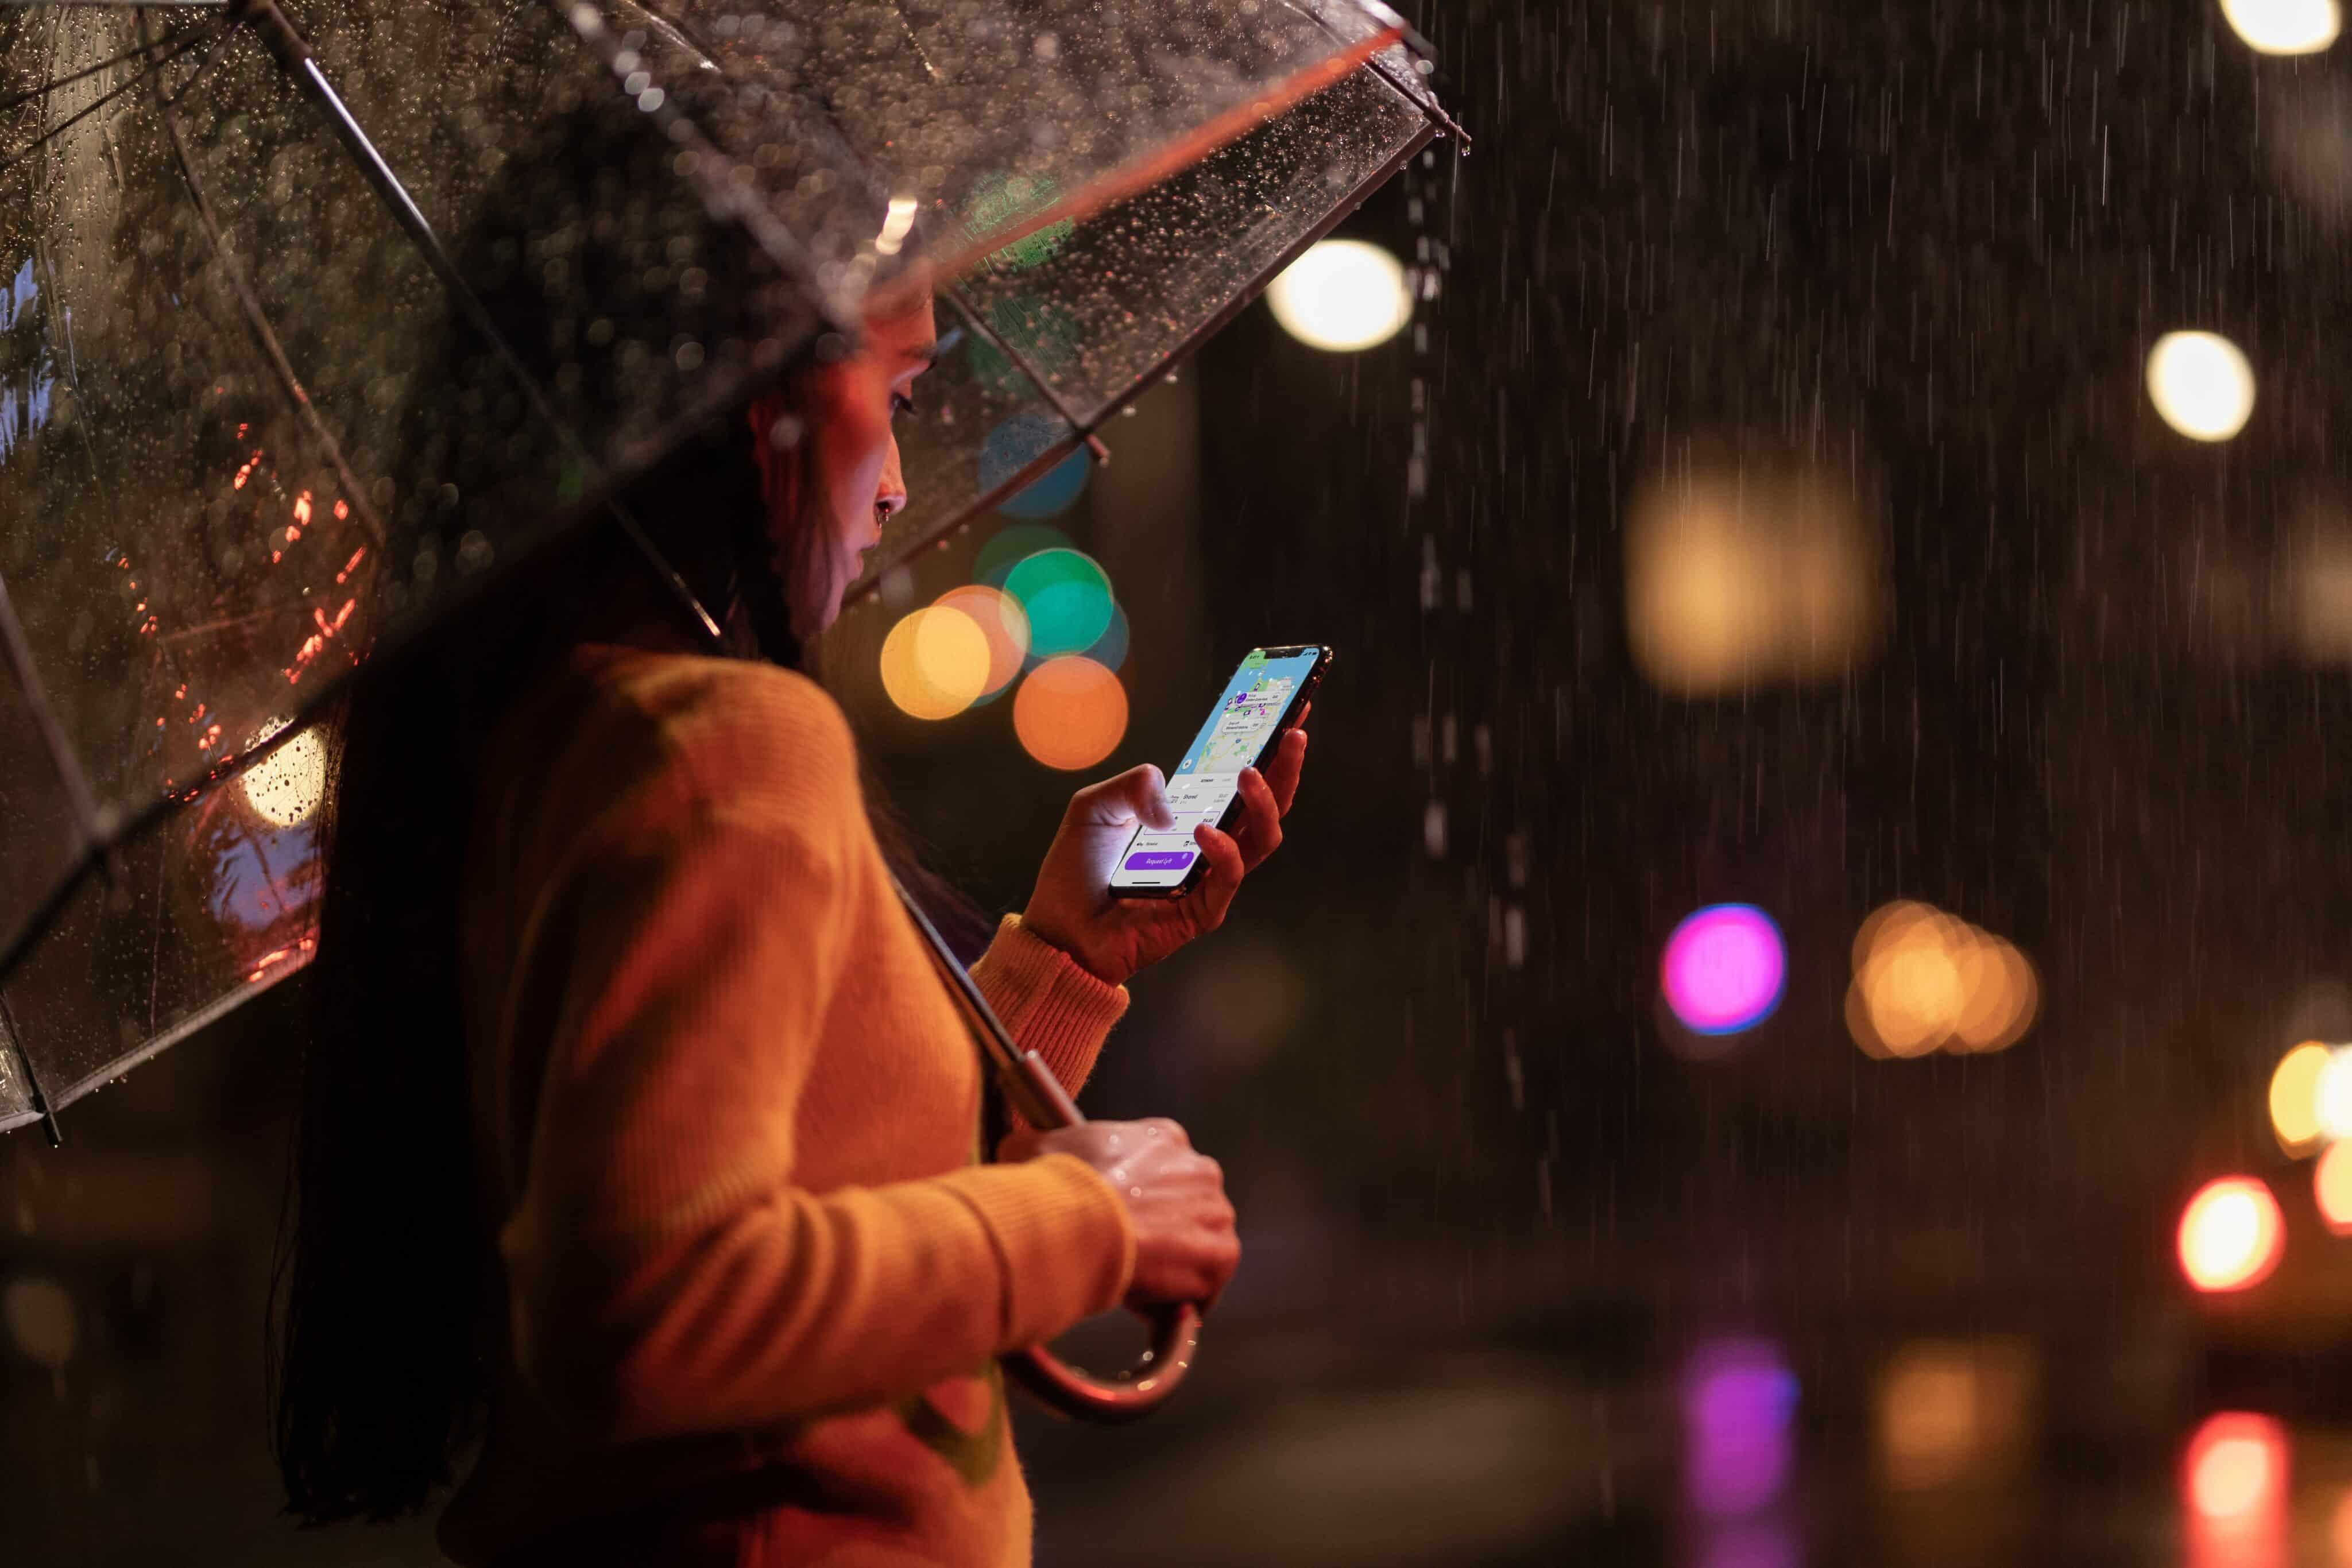 Pessoa na chuva usando um iPhone Xs